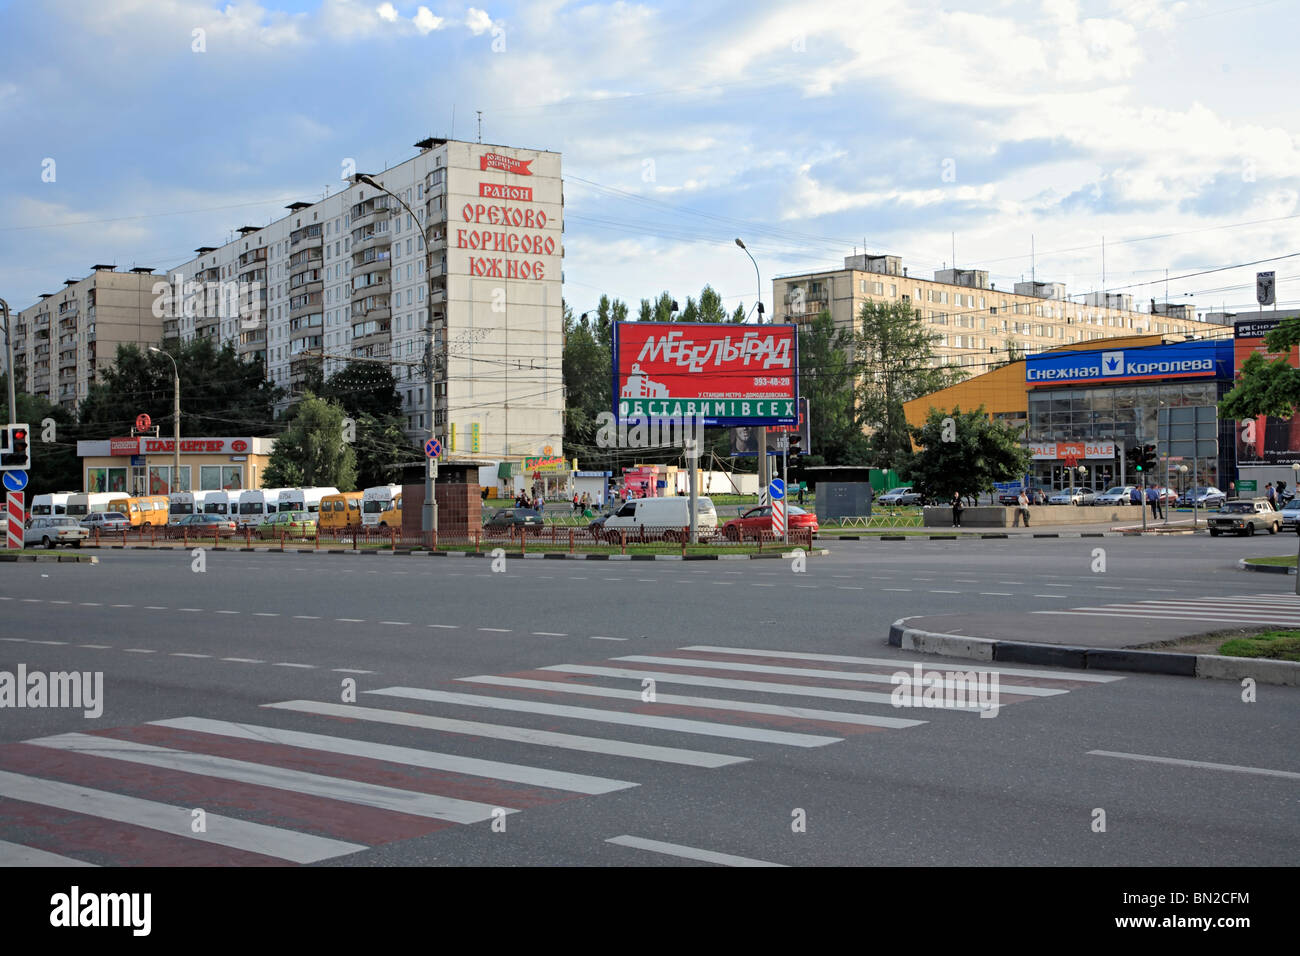 Orekhovo-Borisovo Yuzhnoye district, Moscow, Russia - Stock Image